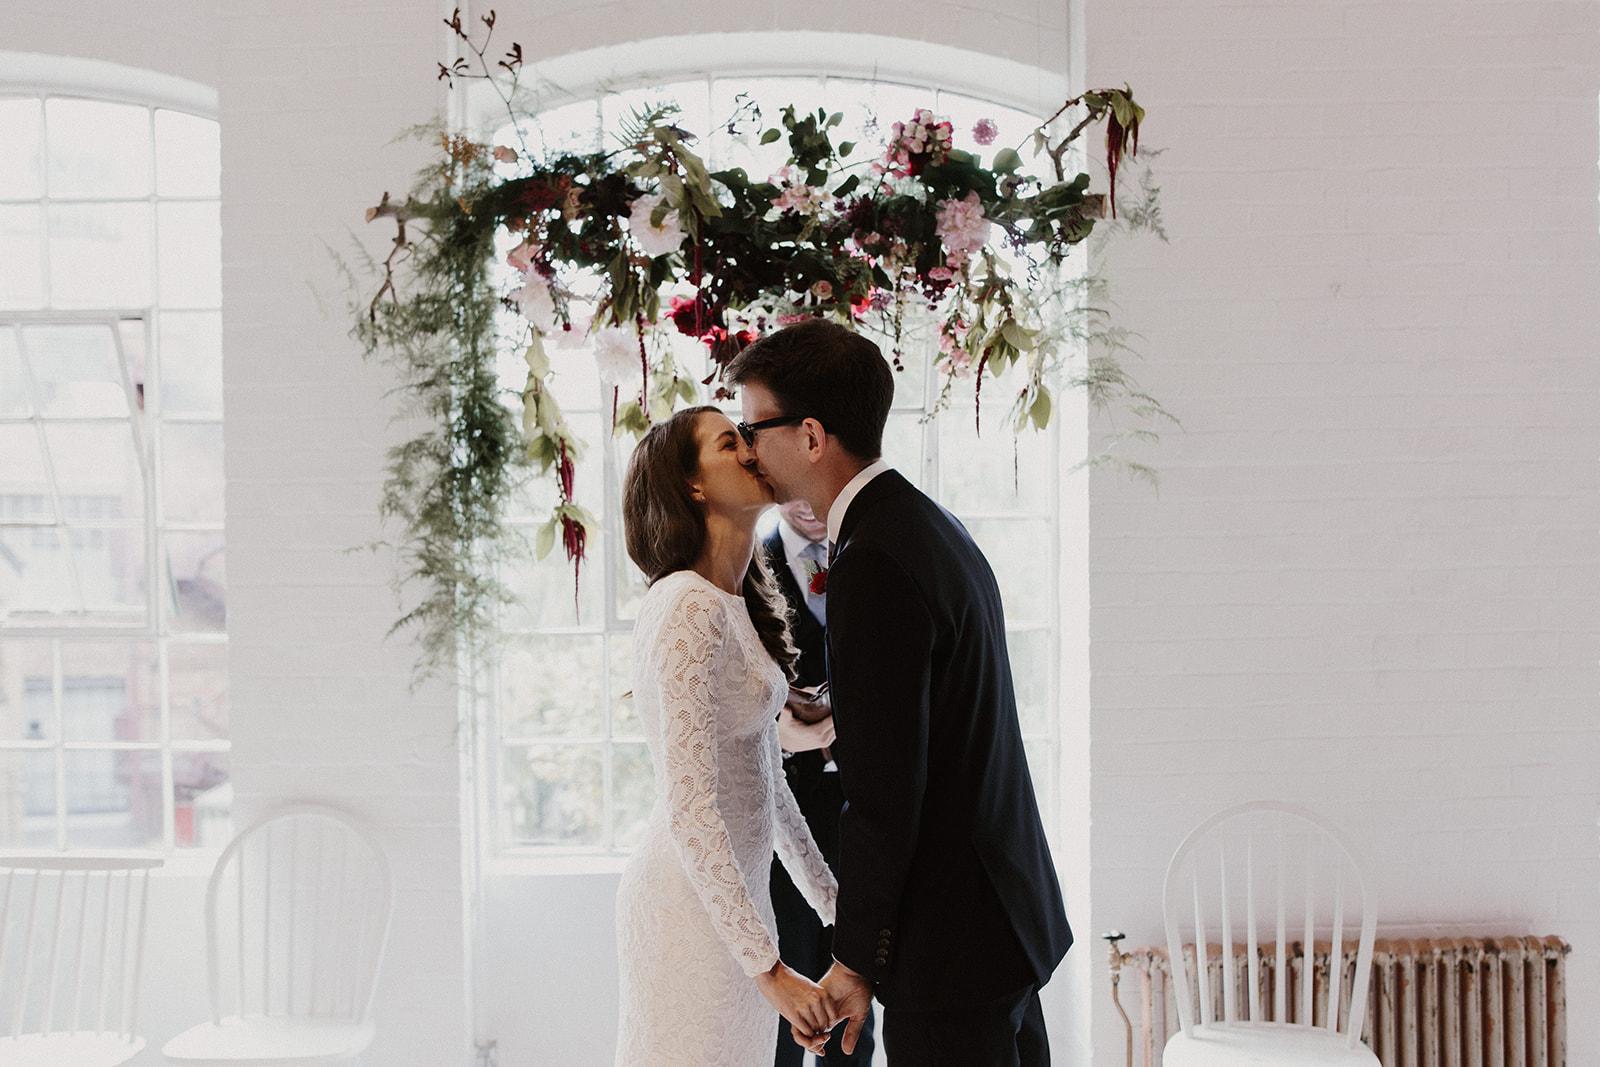 Adam and Emily - 04 - Ceremony - Sara Lincoln Photography-100.jpg